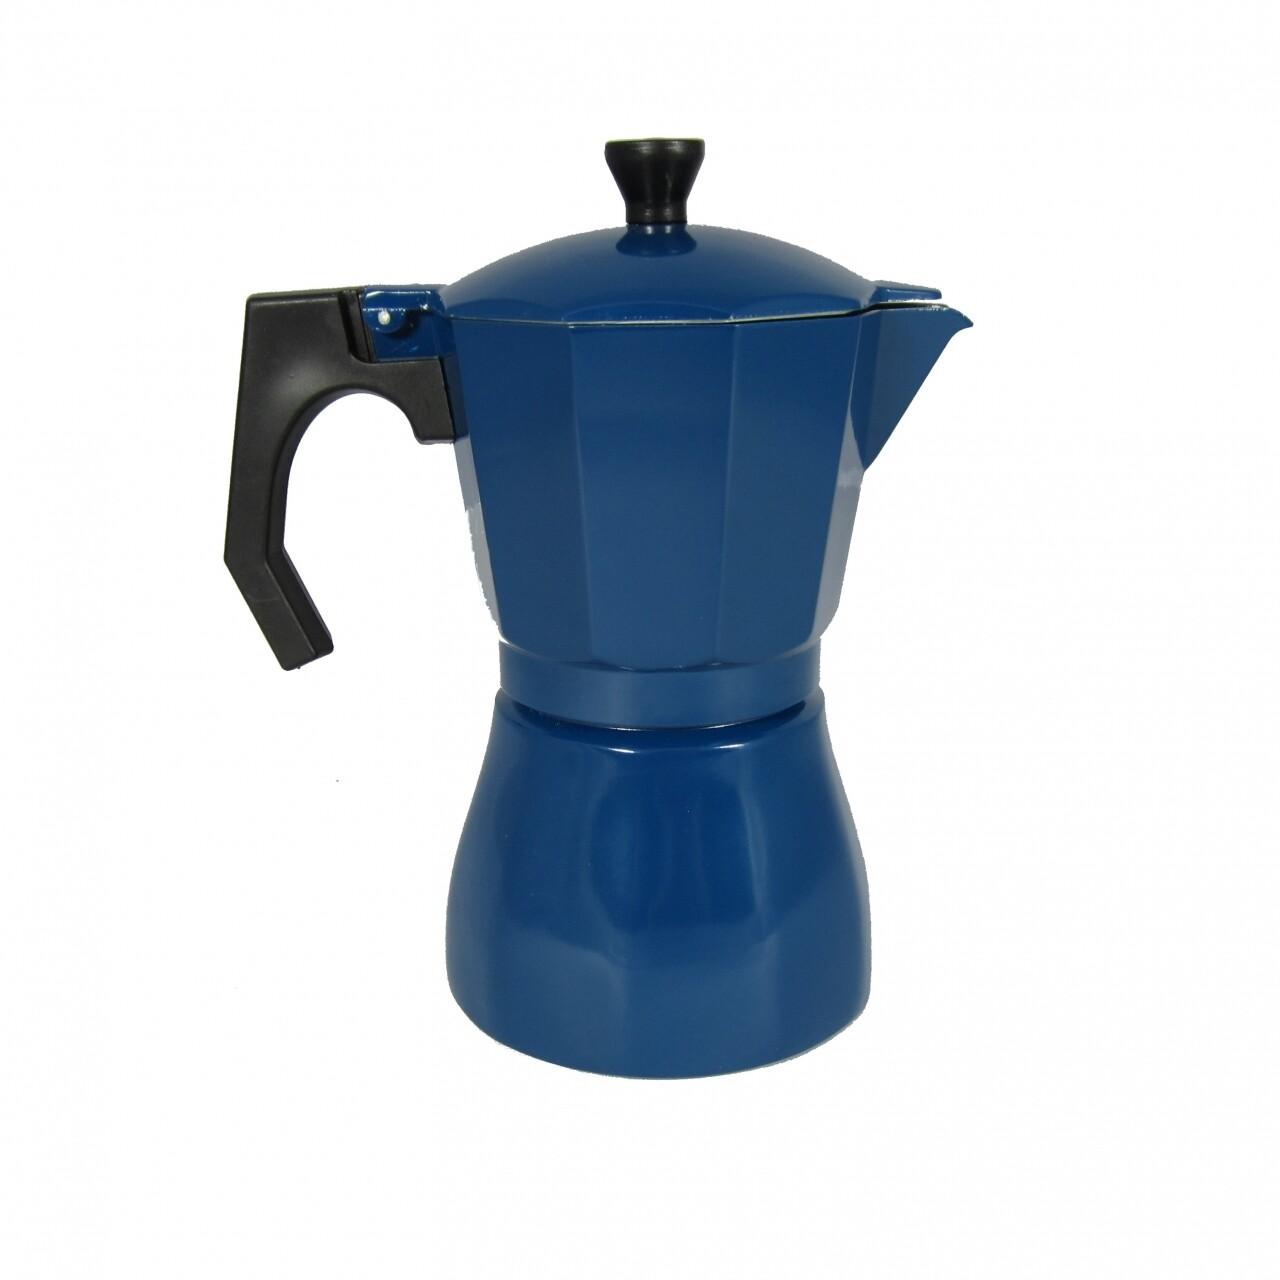 Cafetiera Italian Garneti, Jocca, 10 x 16 x 19 cm, aluminiu, albastru inchis